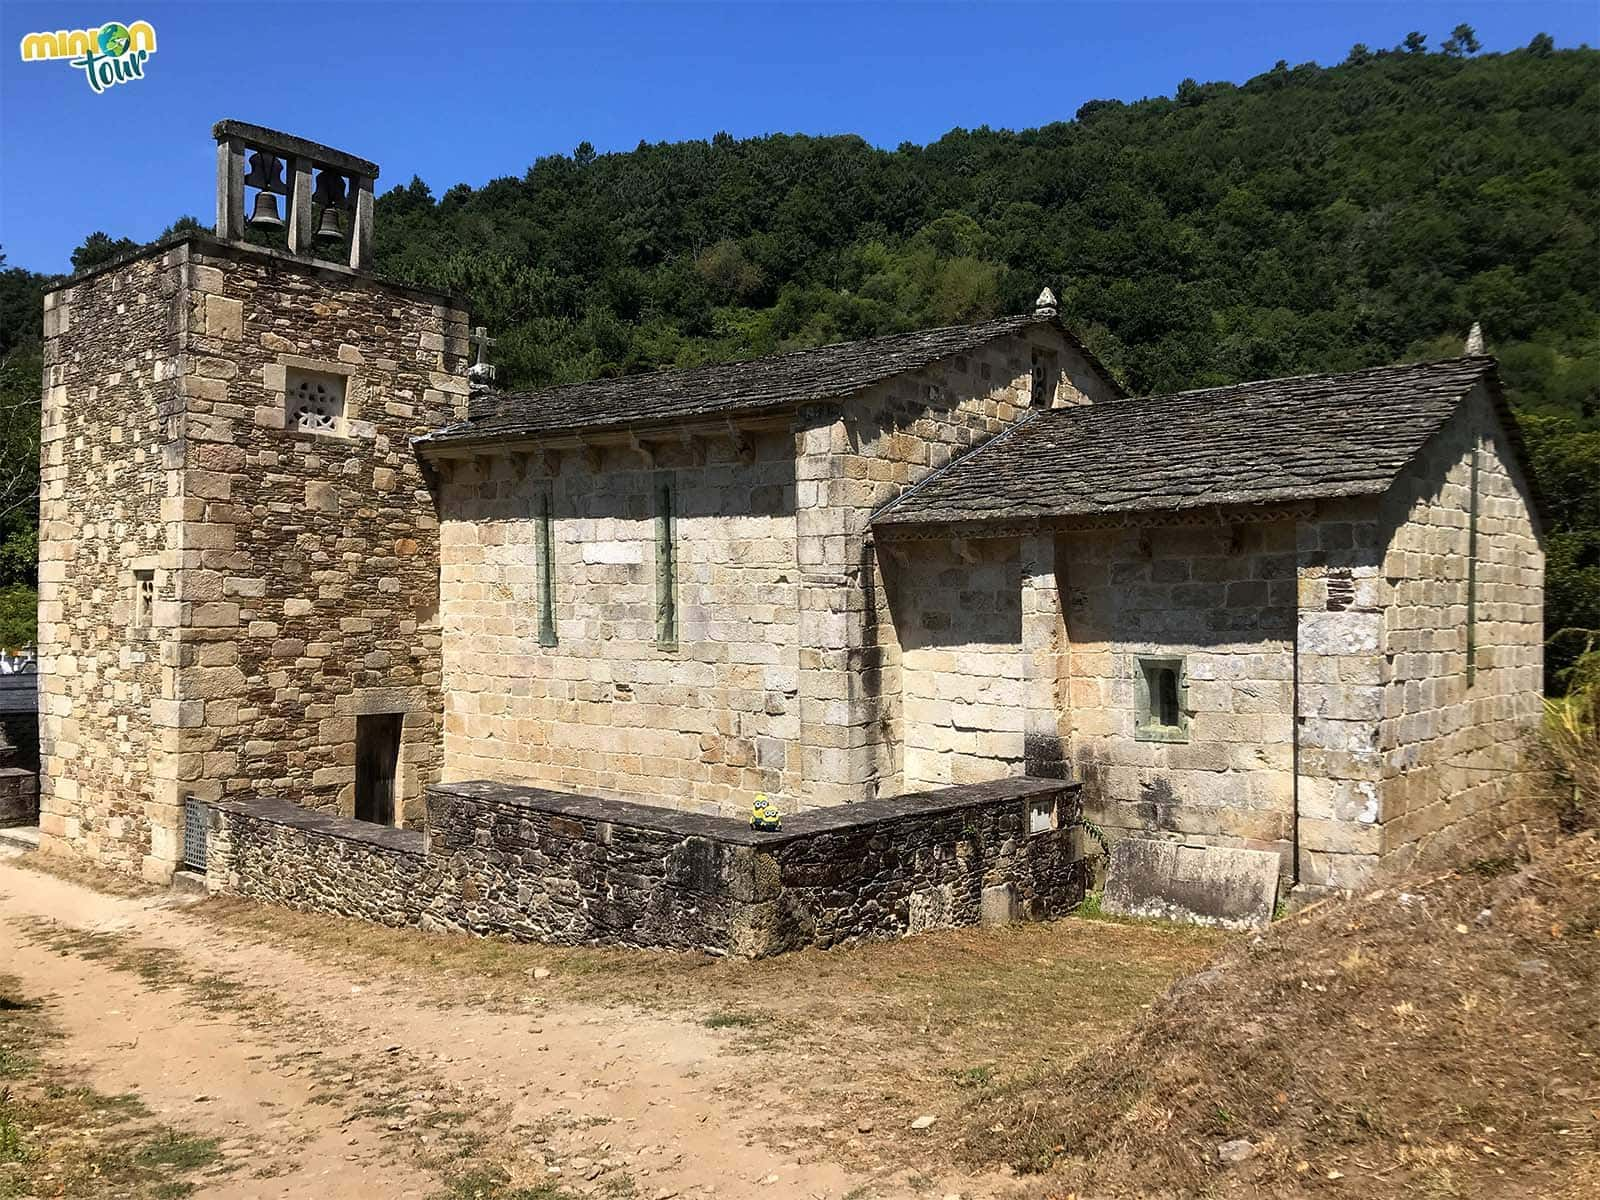 Ruta del Románico de la Ribeira Sacra. Parte 1